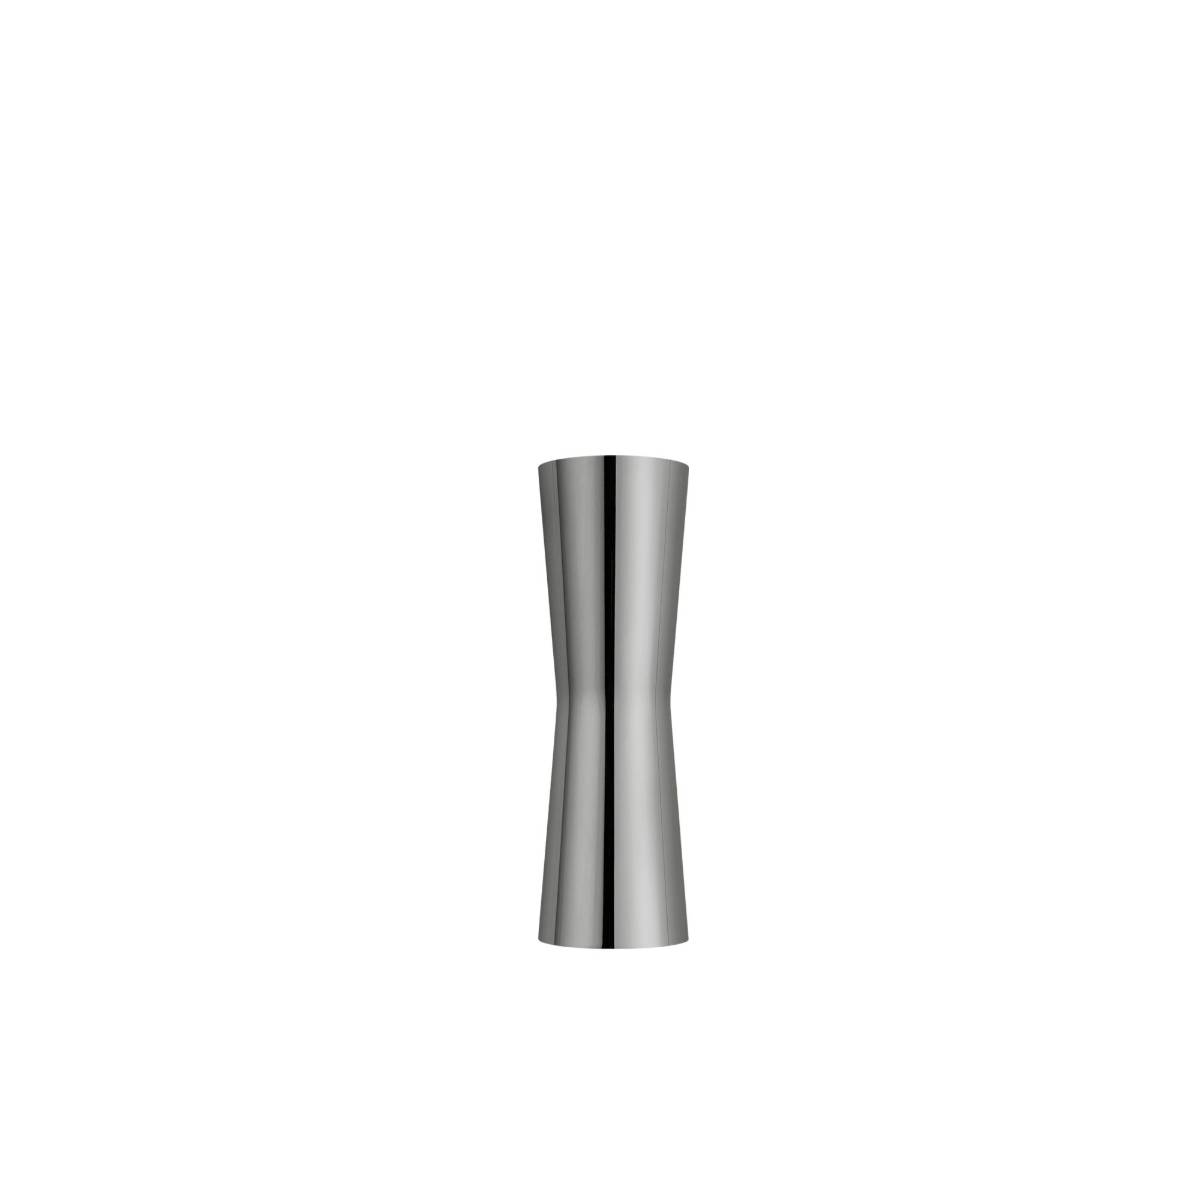 Flos Clessidra 40 Graden Wandlamp-Buitenlamp